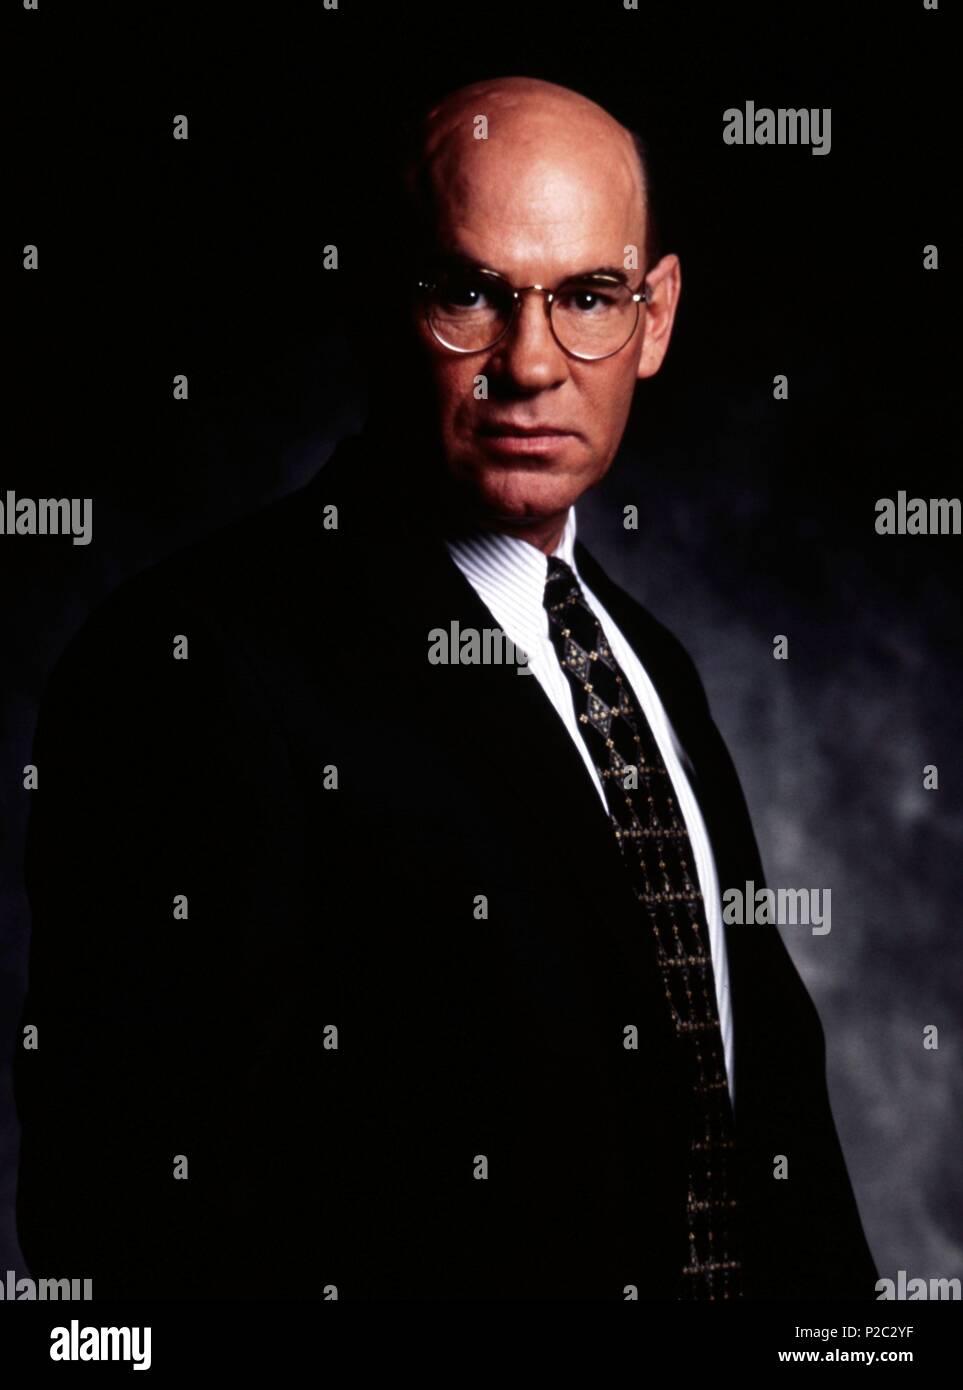 Original Film Title: THE X FILES.  English Title: THE X FILES.  Film Director: CHRIS CARTER; ROB BOWMAN; DAVID NUTTER.  Year: 1993.  Stars: MITCH PILEGGI. Credit: FOX FILMS / MOSKOWITZ, KAREN / Album - Stock Image